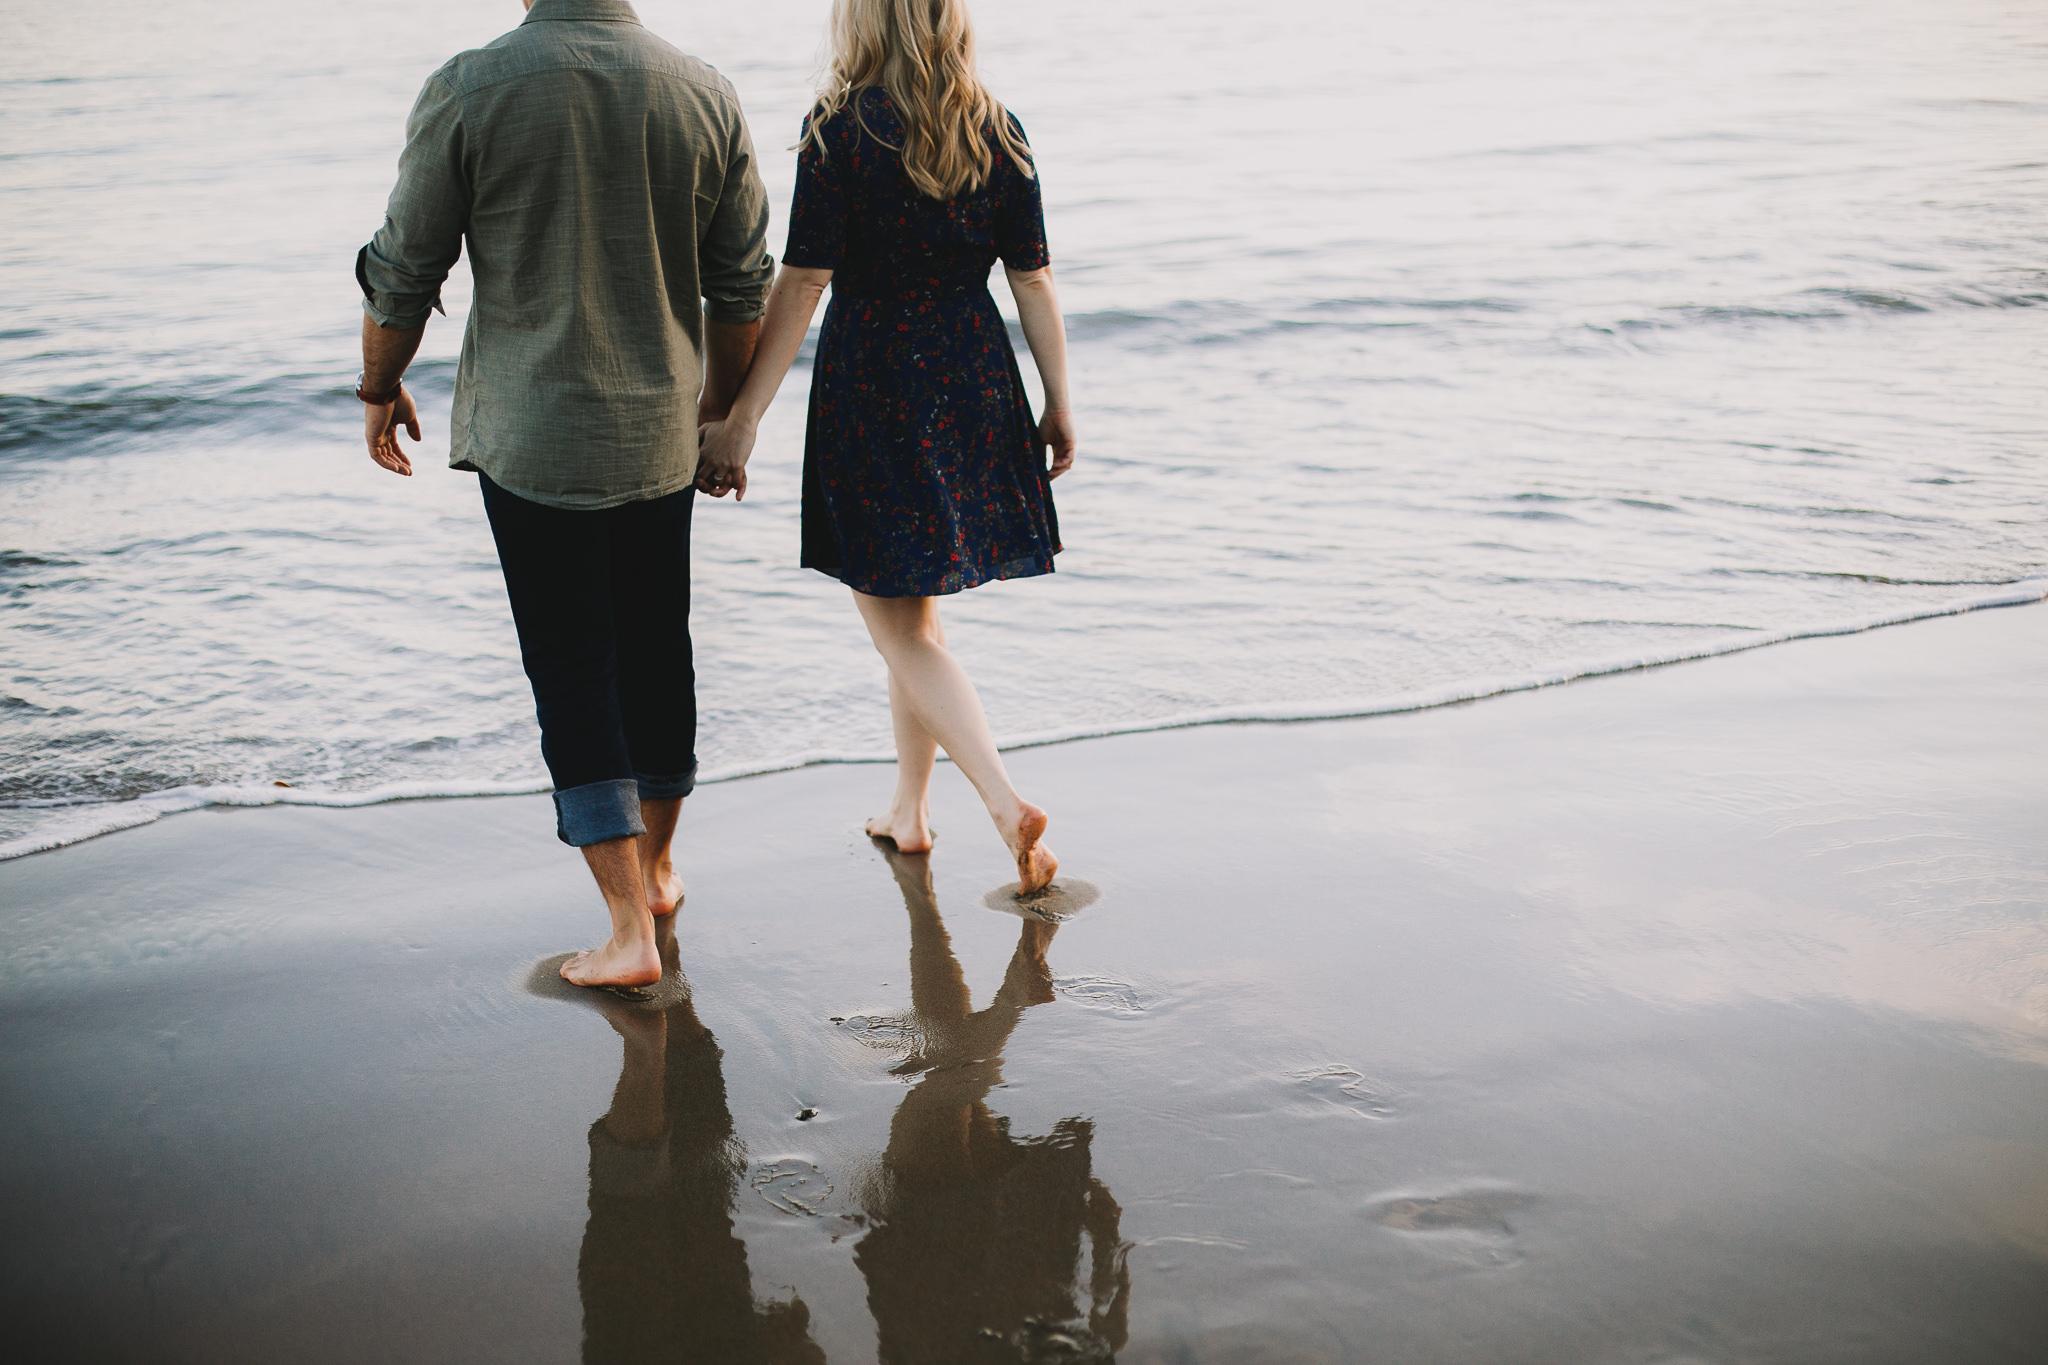 Archer Inspired Photography Capitola Beach Santa Cruz Wedding Engagement Lifestyle Session Photographer-98.jpg